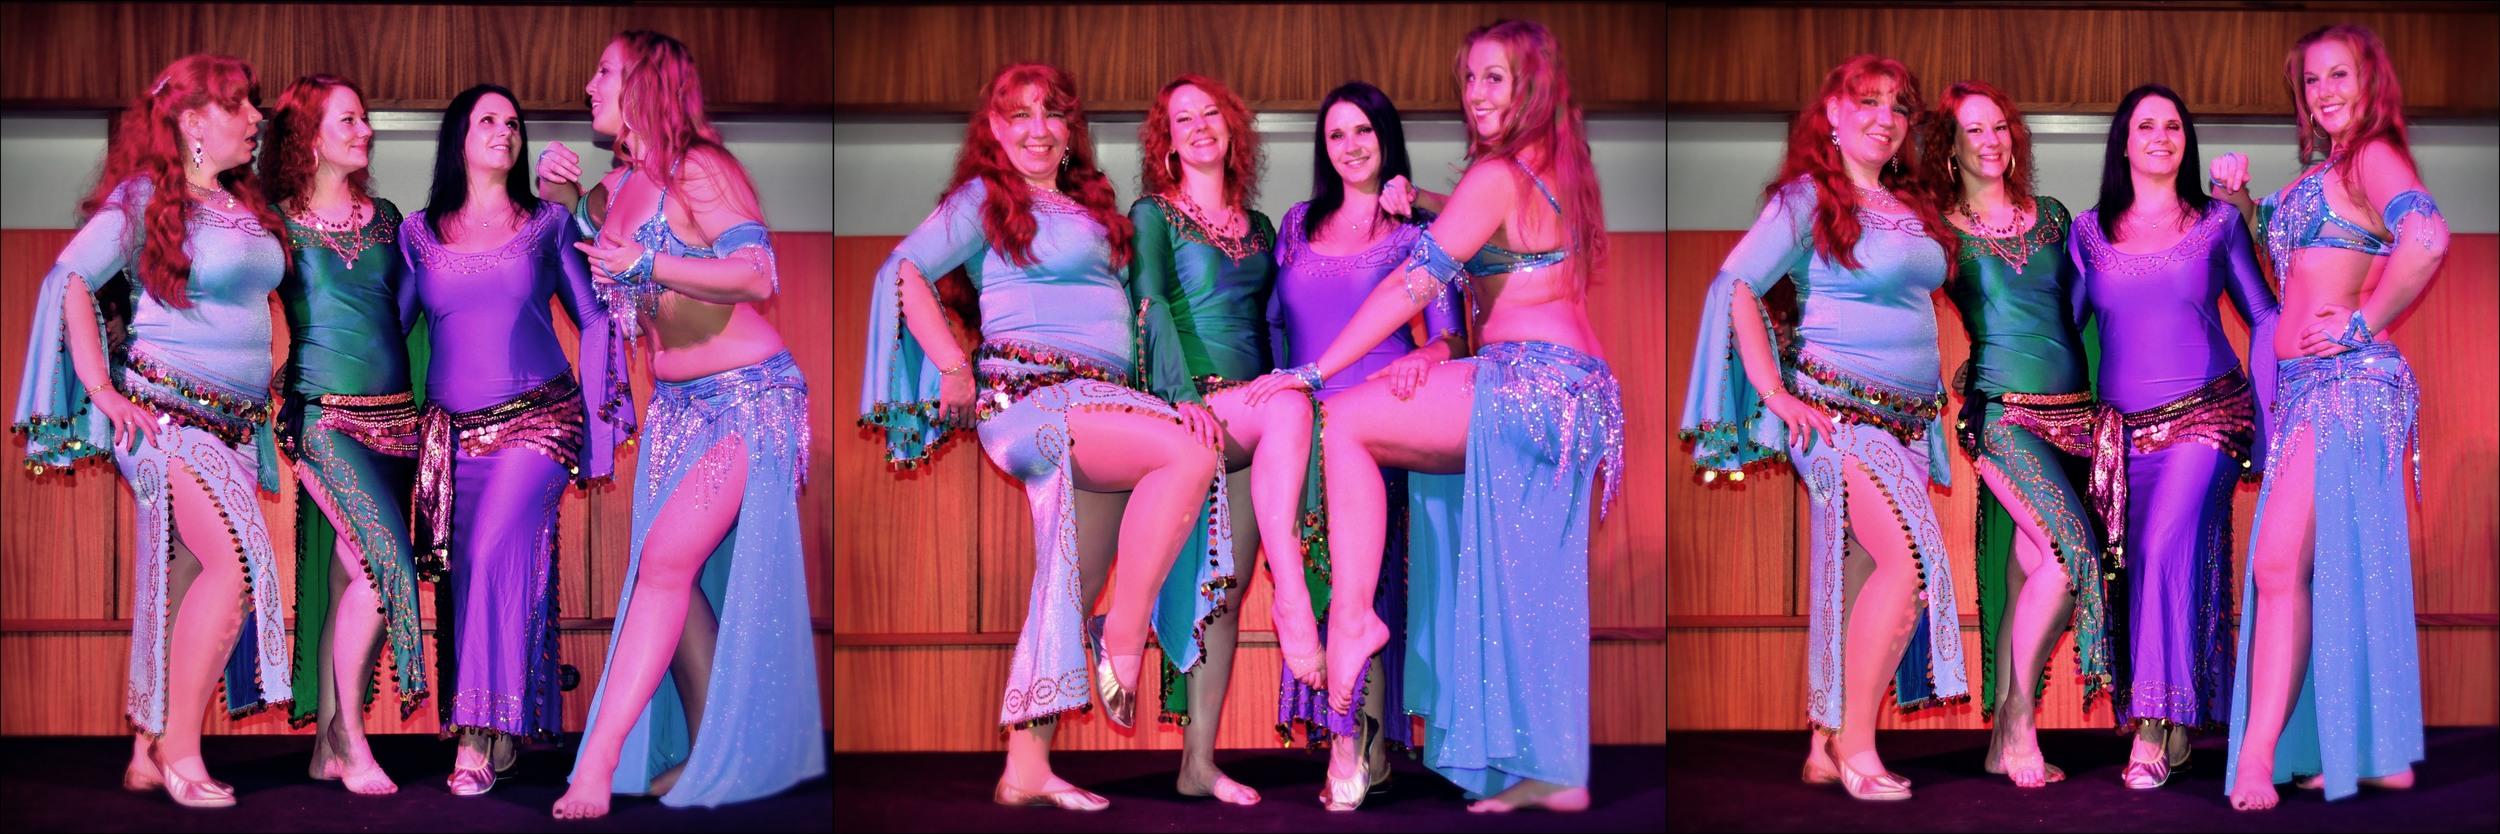 MariaOriental - Blog2015 - Orientalisk dans, hafla (20151114)